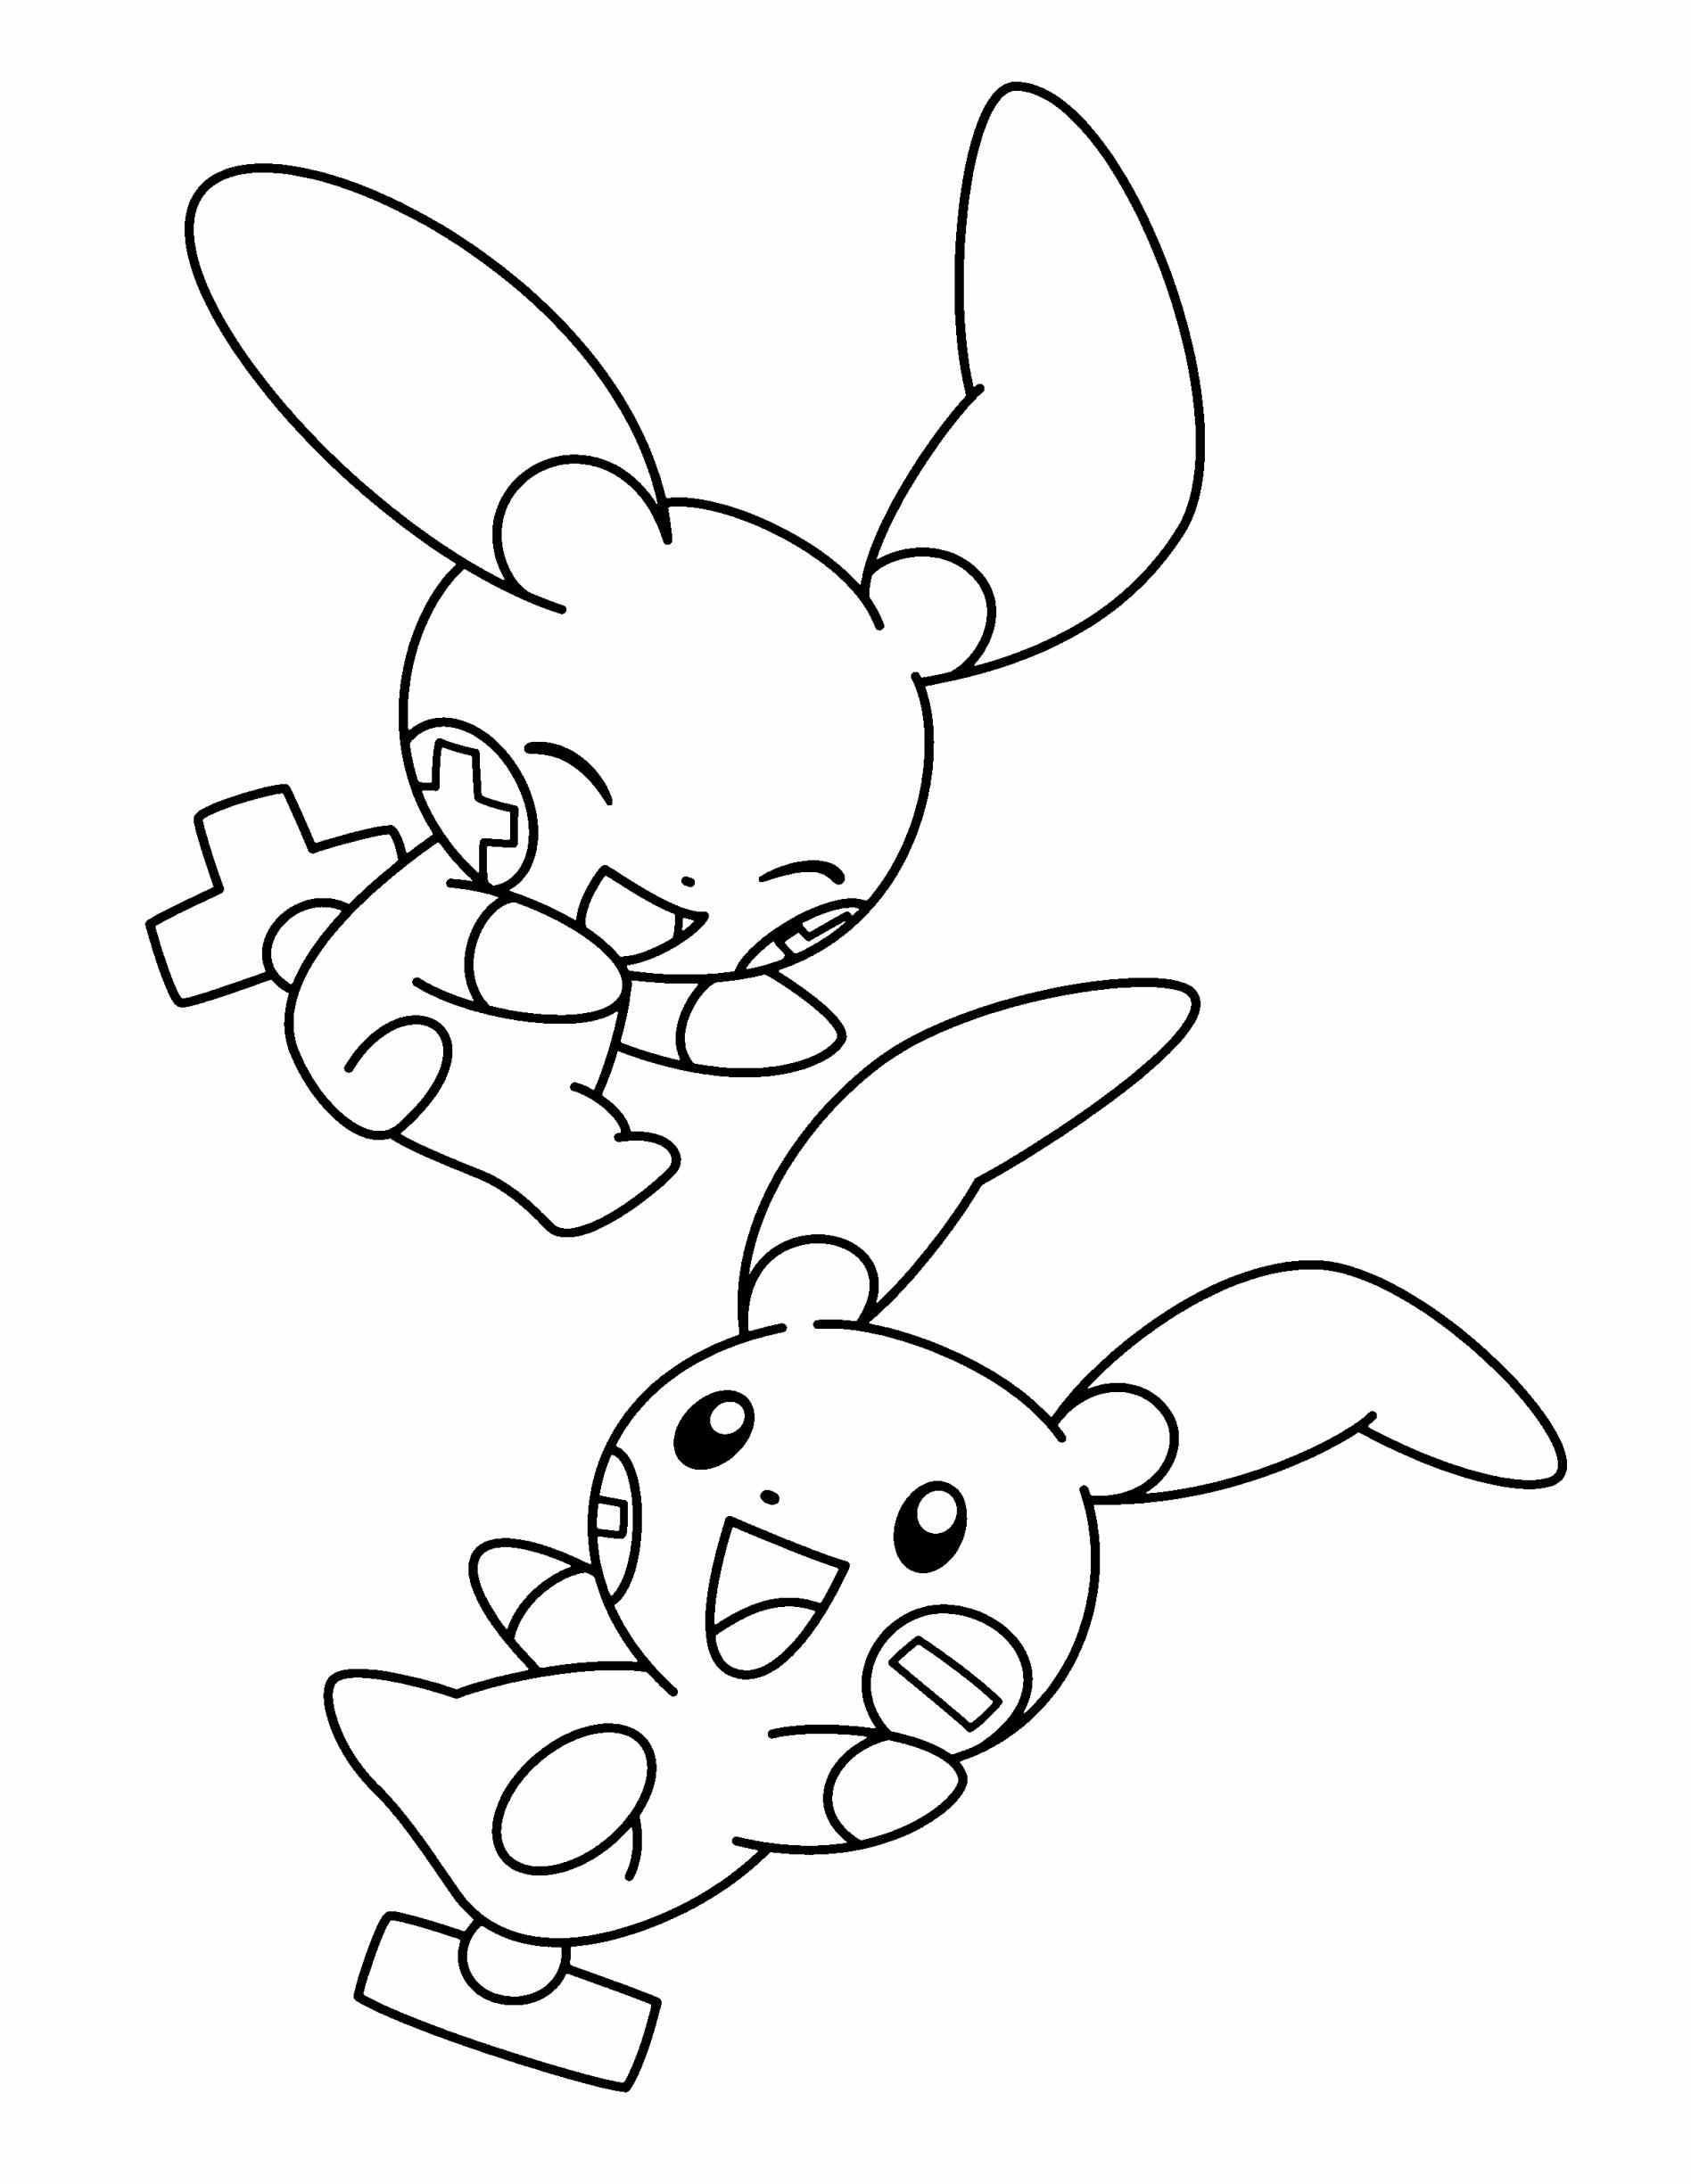 Wallpaper Animasi Bergerak ①